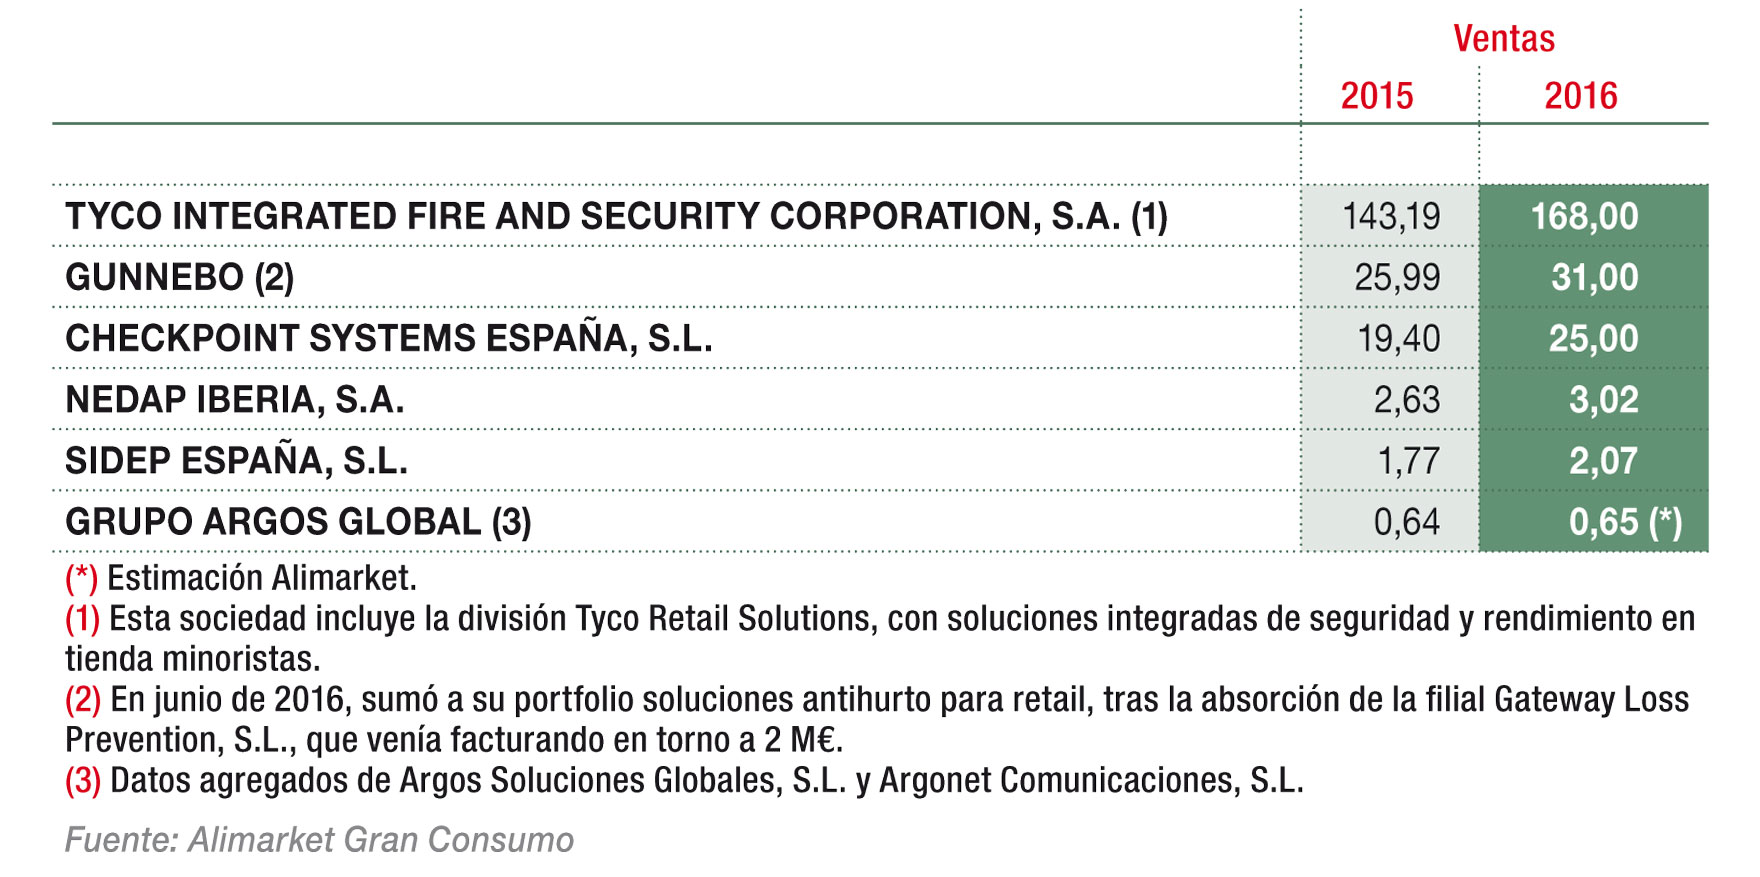 Principales empresas de sistemas antihurto (M€)